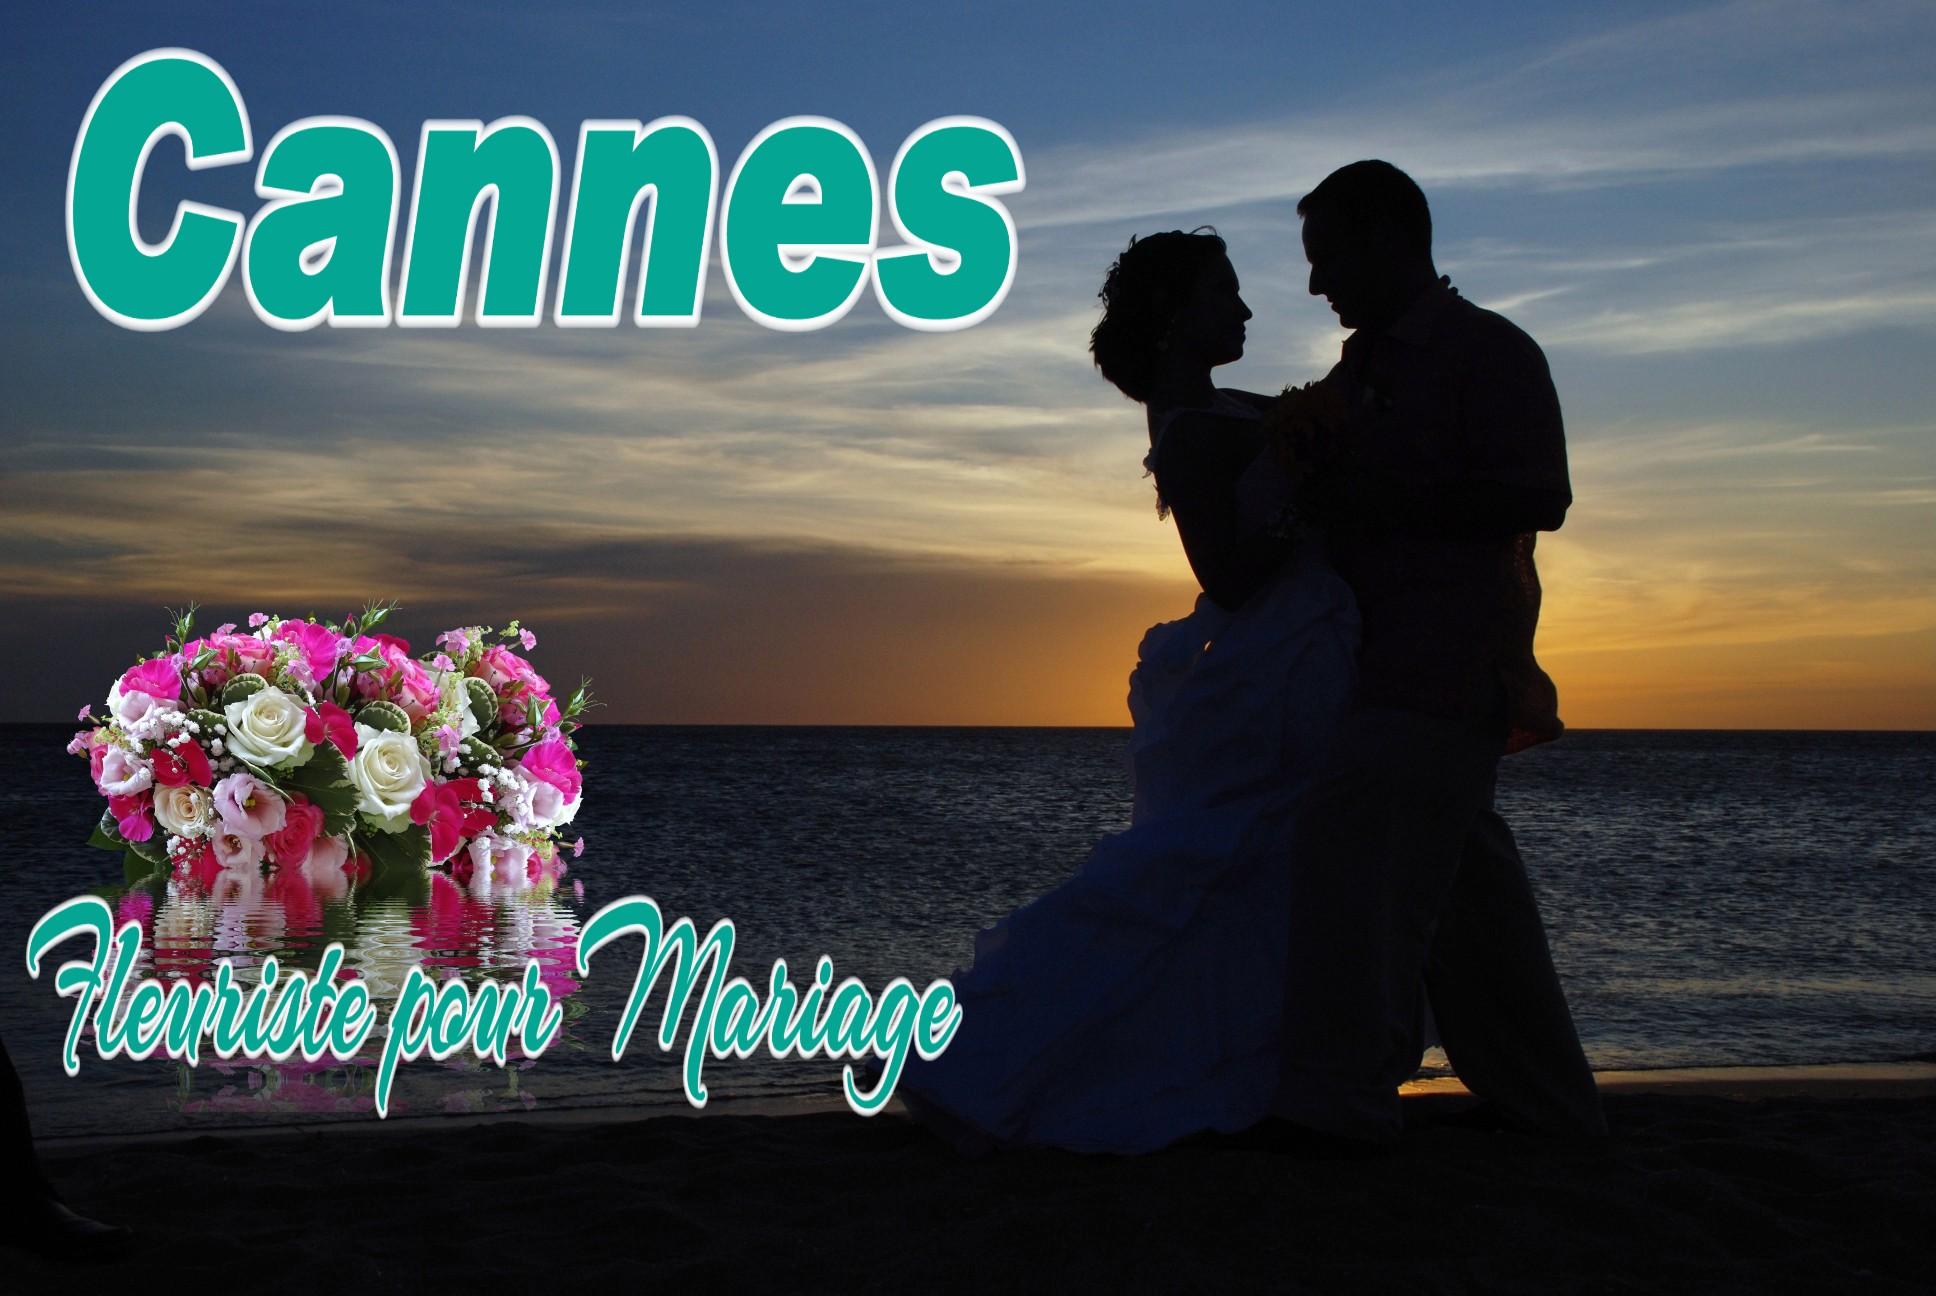 FLEURISTE MARIAGE CANNES - WEDDING FLOWERS CANNES